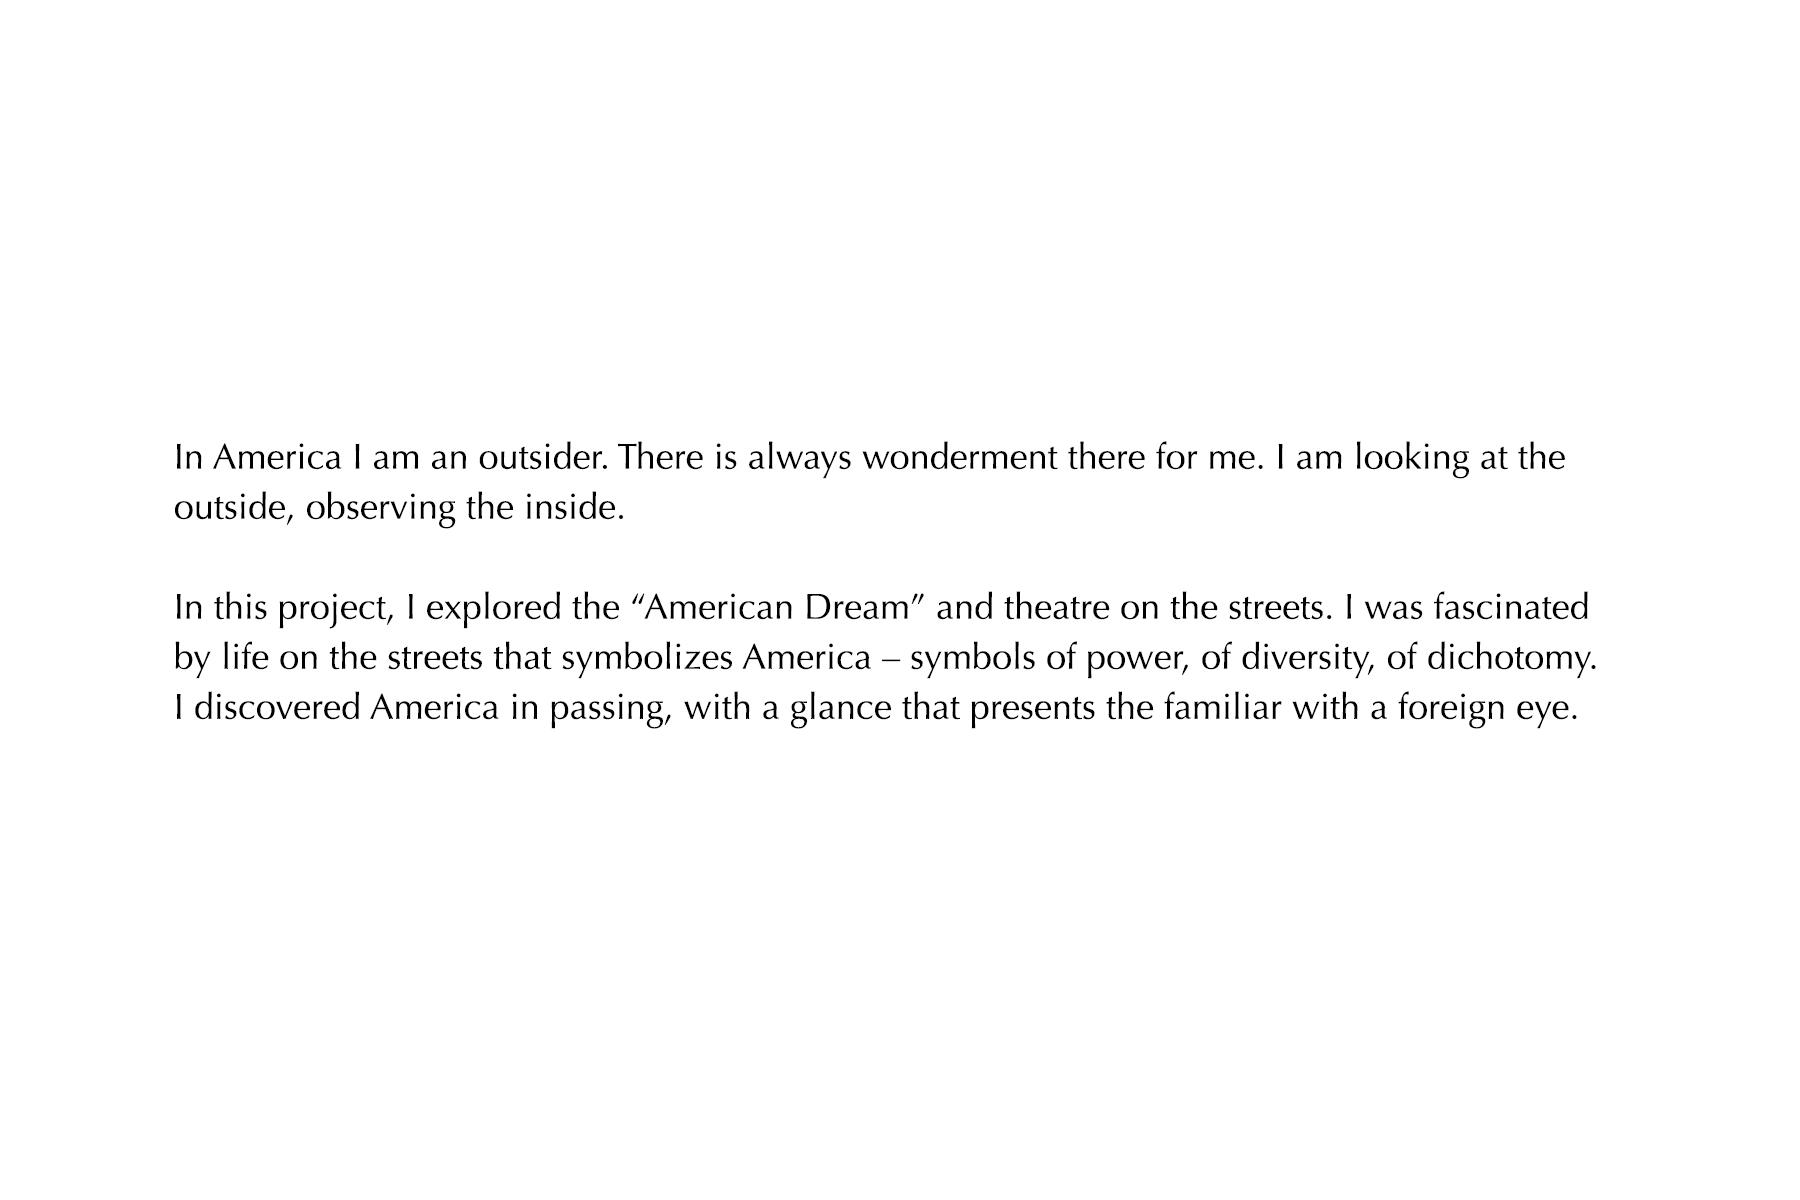 american_theatre_00.jpg